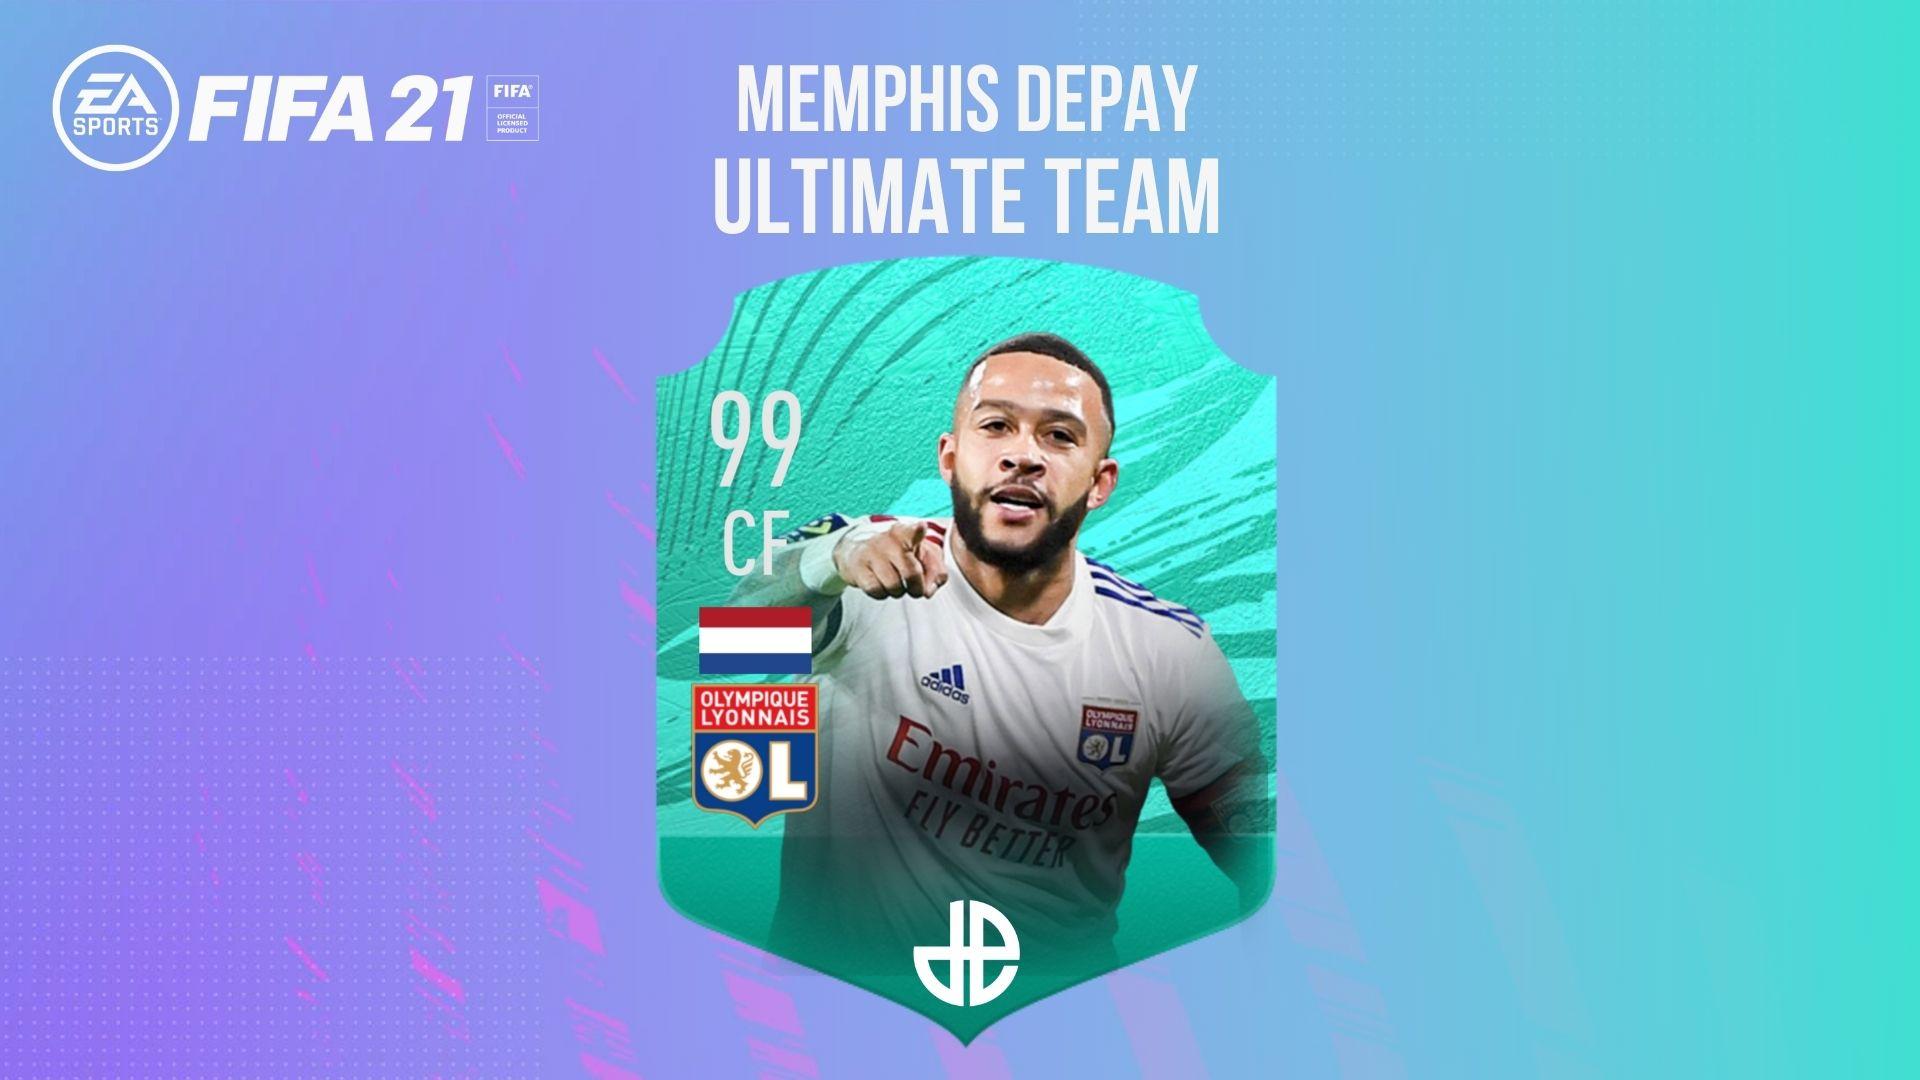 Memphis Depay FIFA Ultimate Team